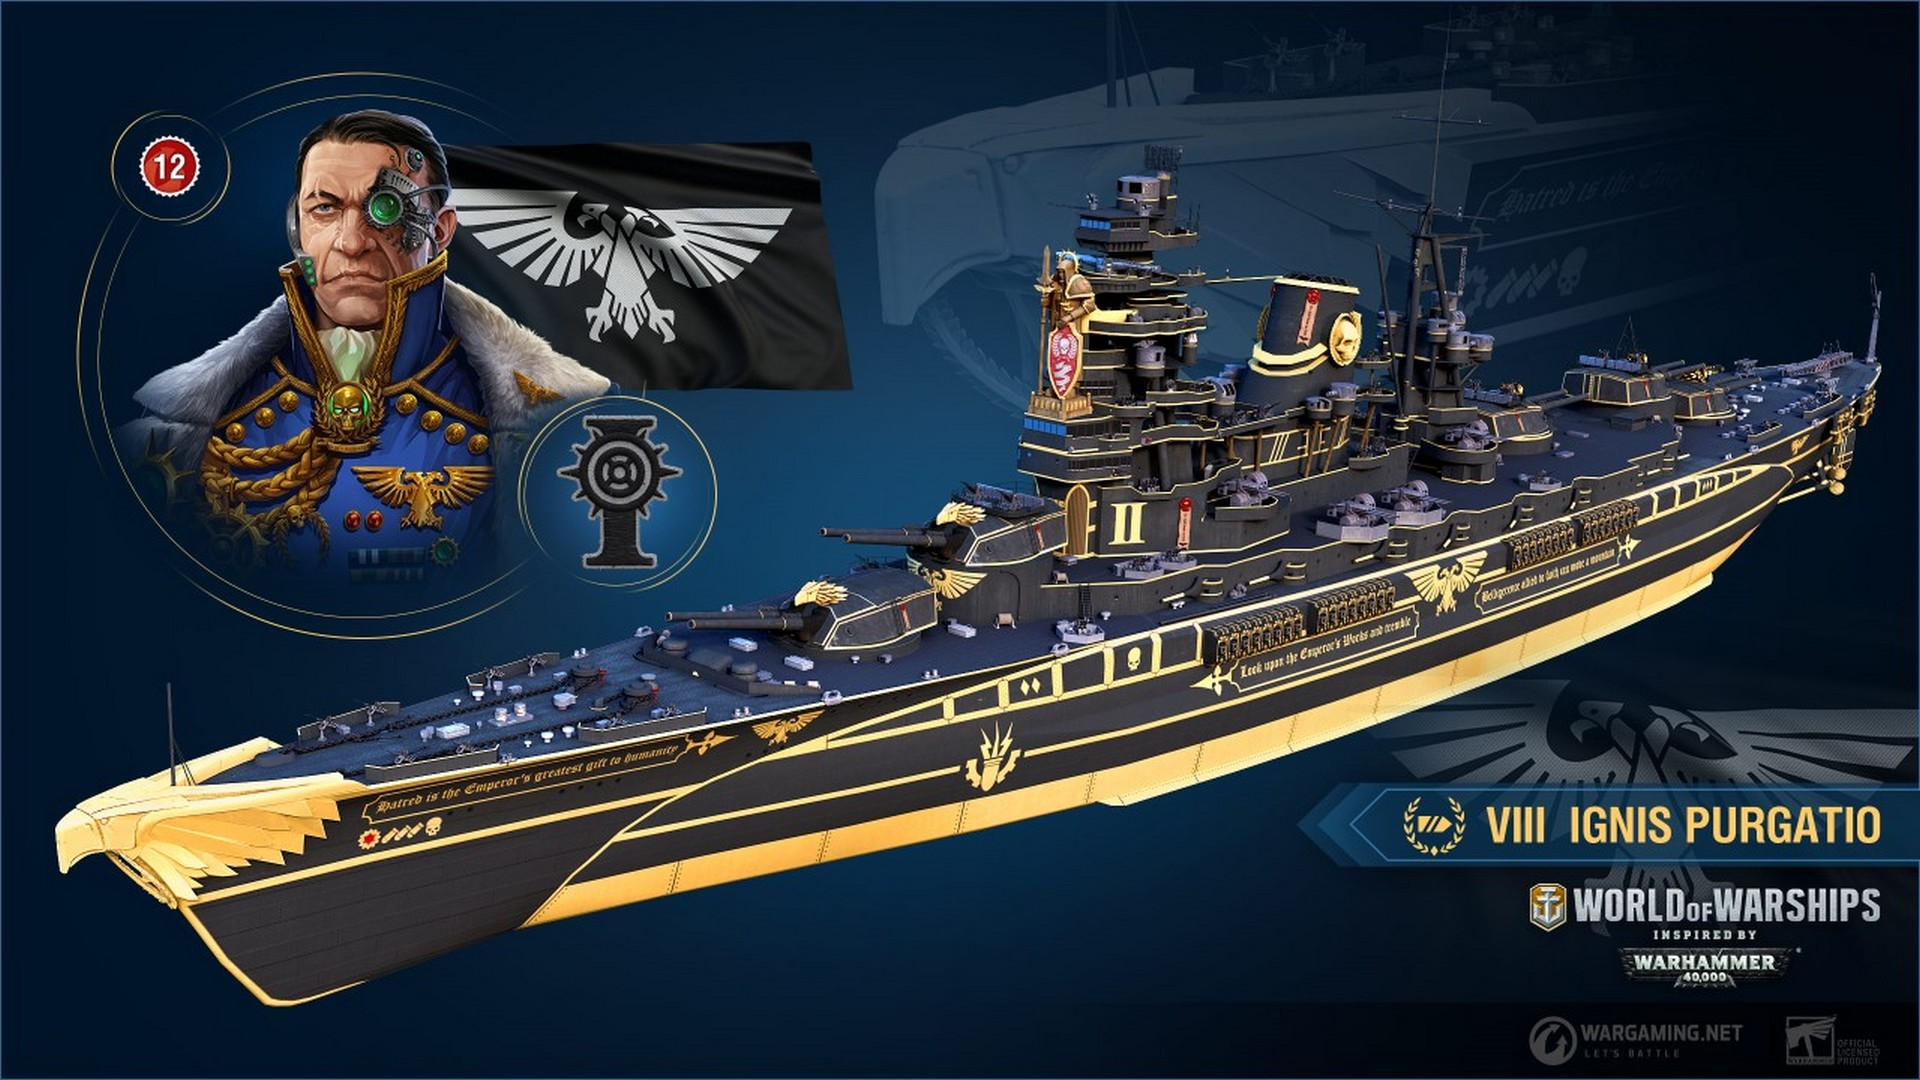 Warhammer 40,000 Invades World of Warships